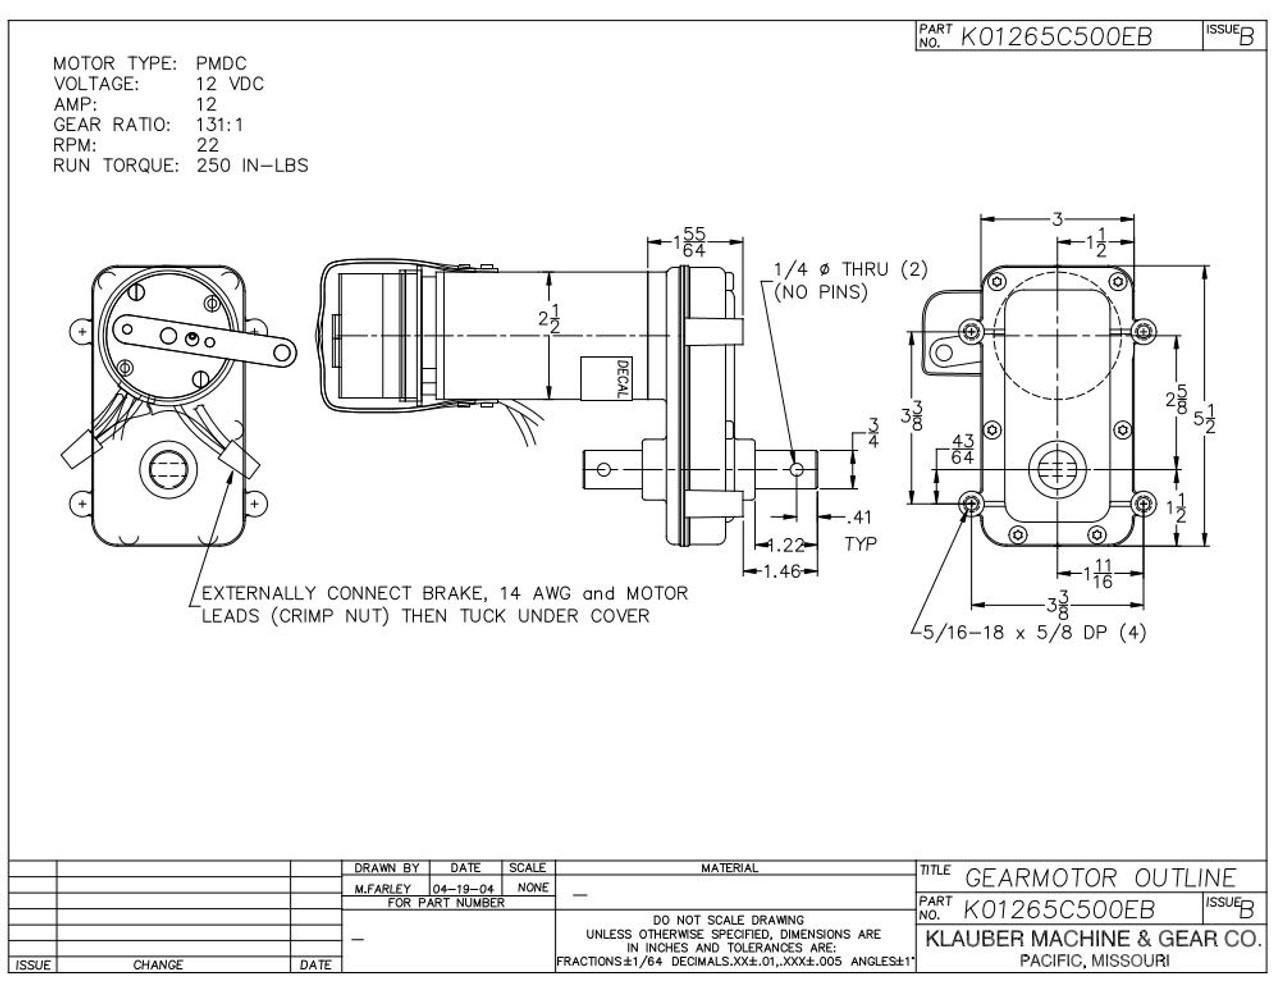 Rv Power Gear Slide Out Motor Pn K01265C500 on